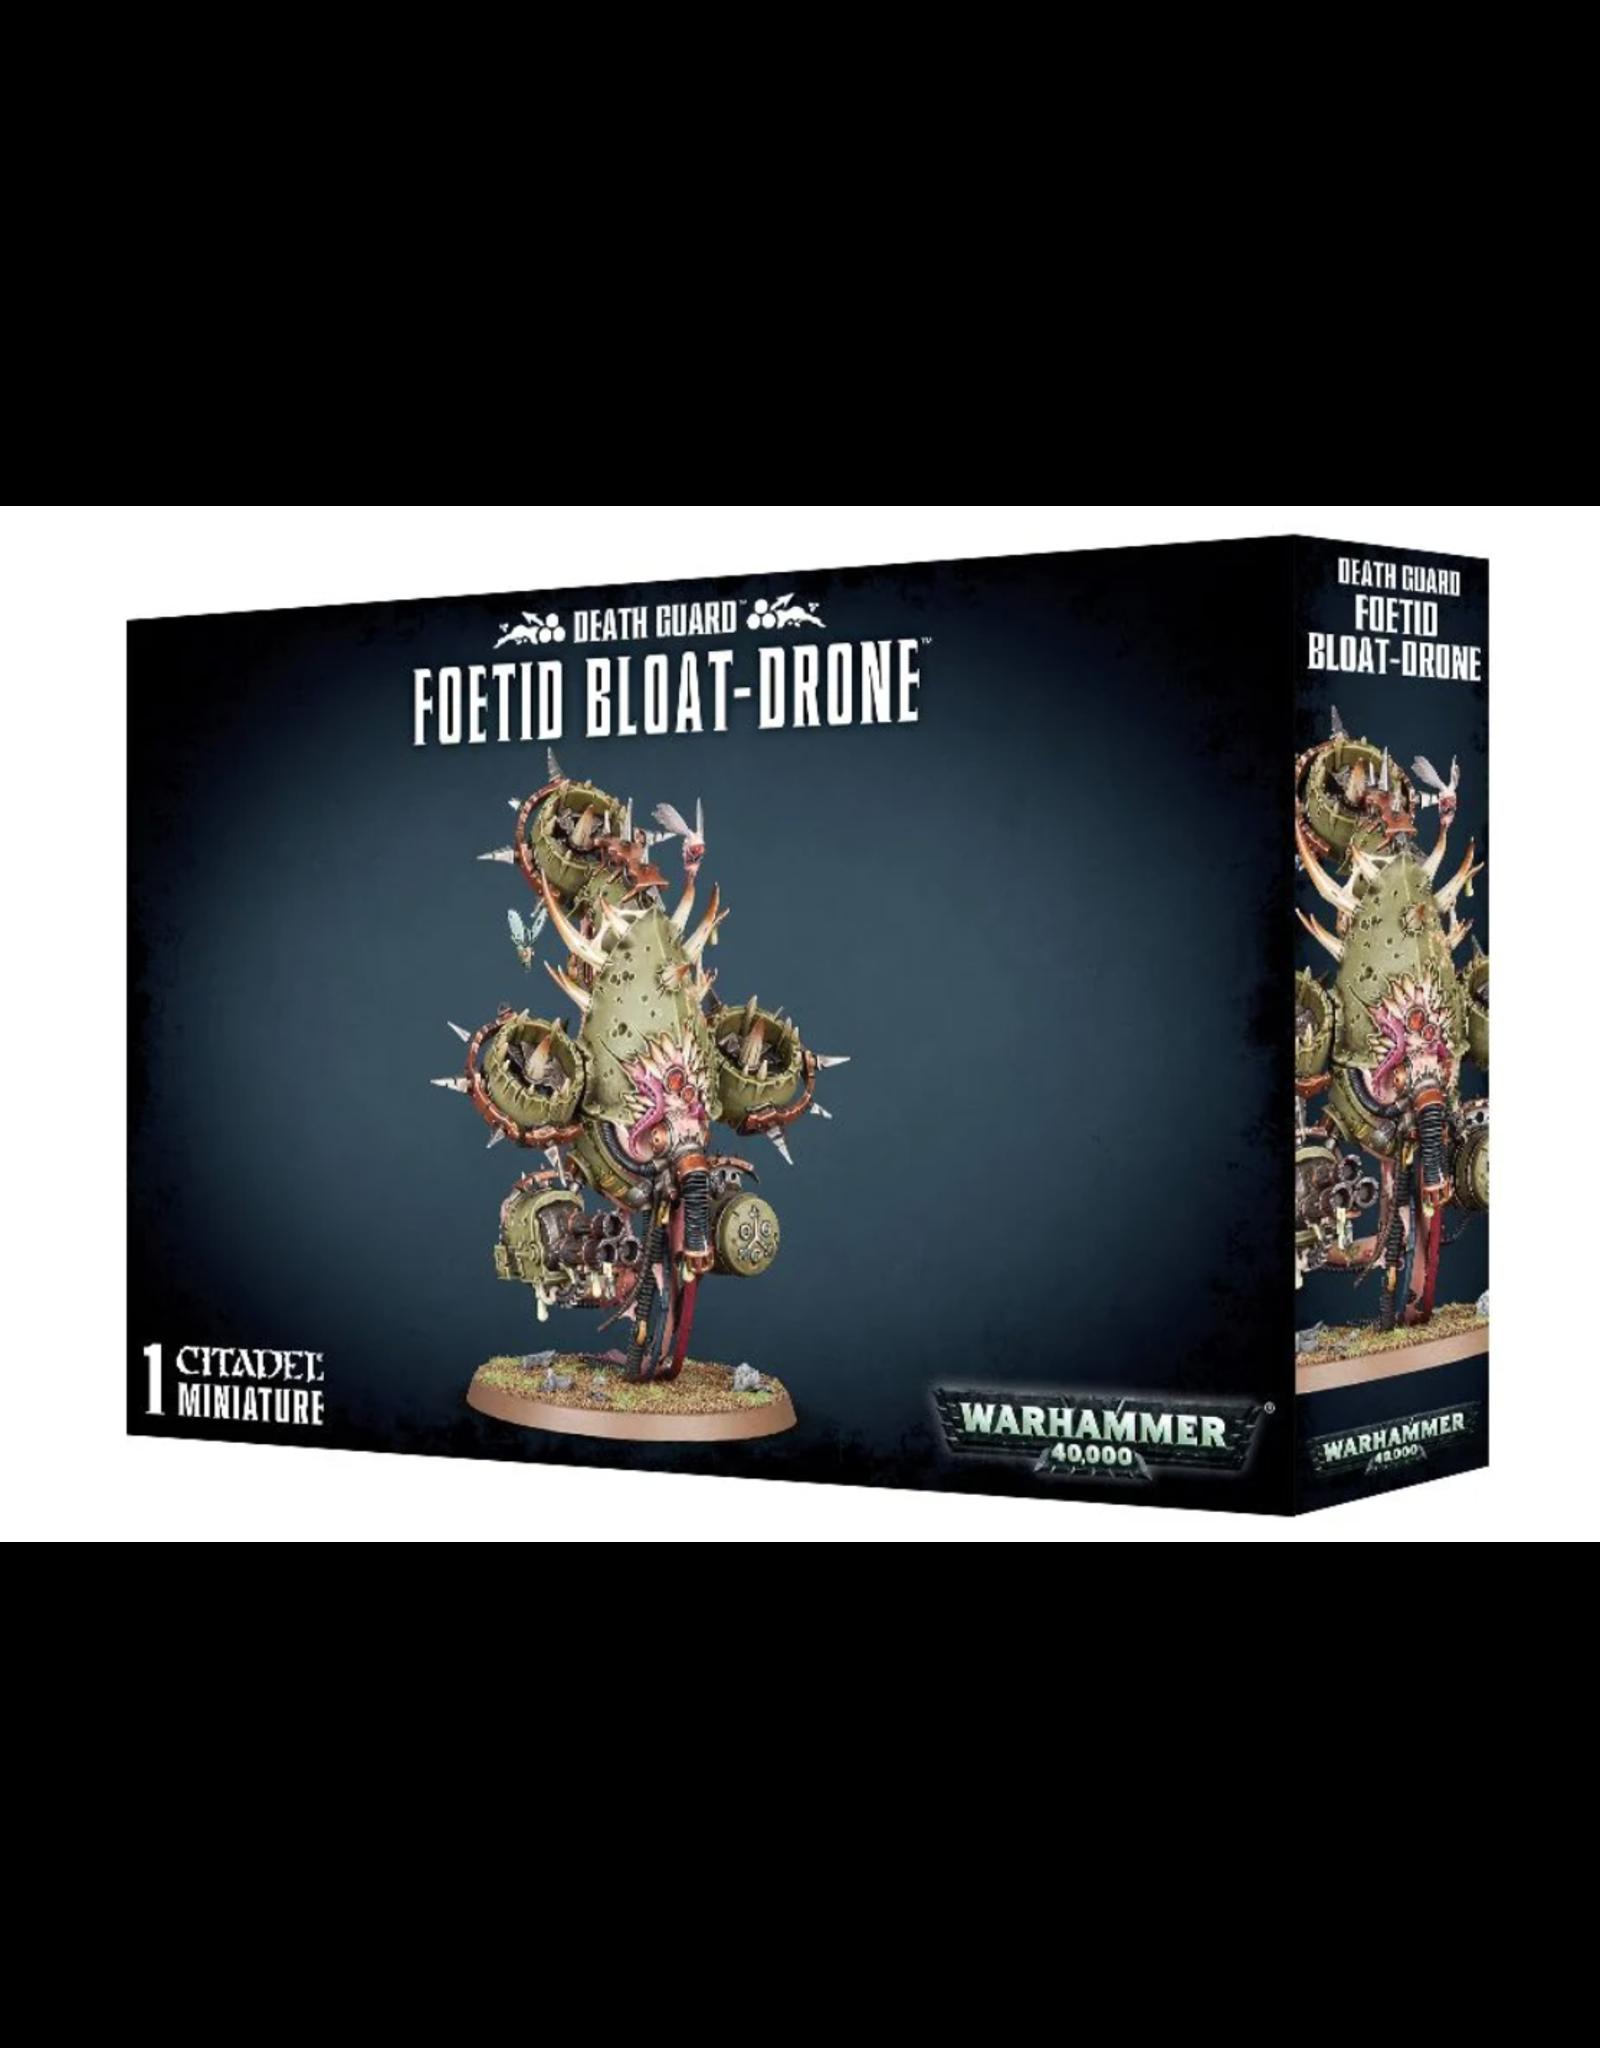 Warhammer 40K Chaos Death Guard: Foetid Bloat-Drone